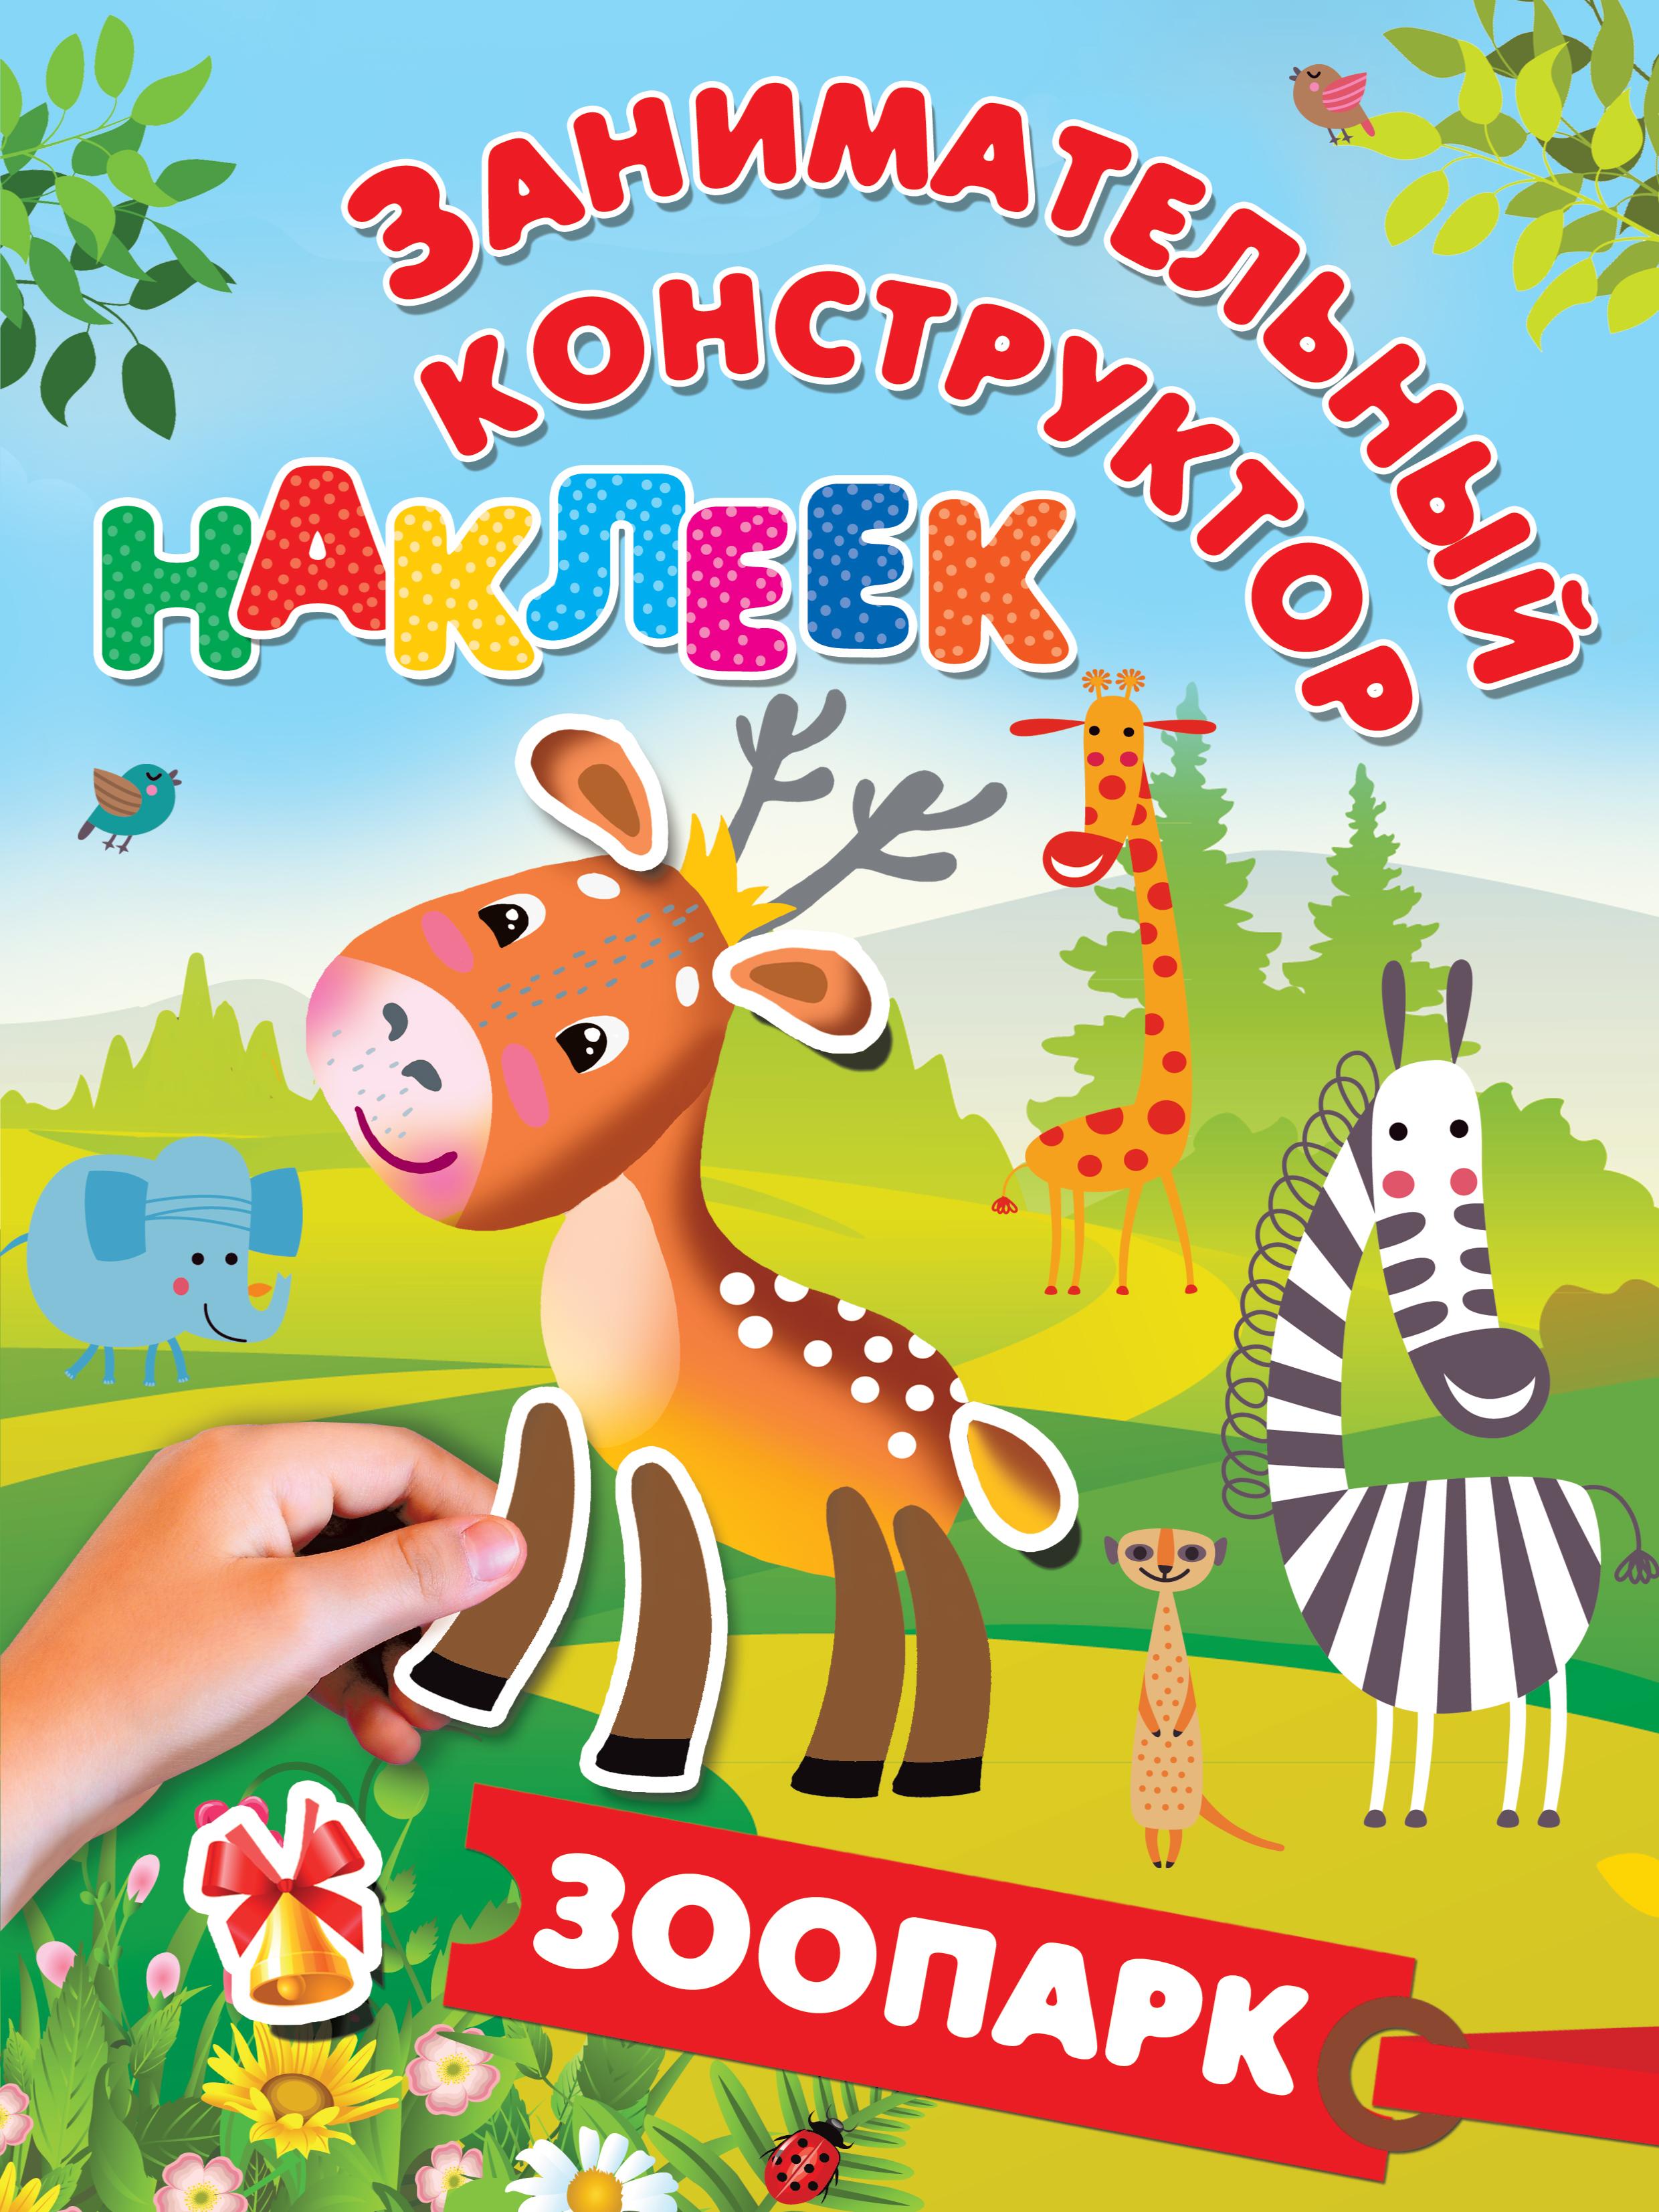 Фото - Дмитриева В.Г., Горбунова И.В. Зоопарк горбунова и худ 100 загадок для малышей книга игра 399 наклеек